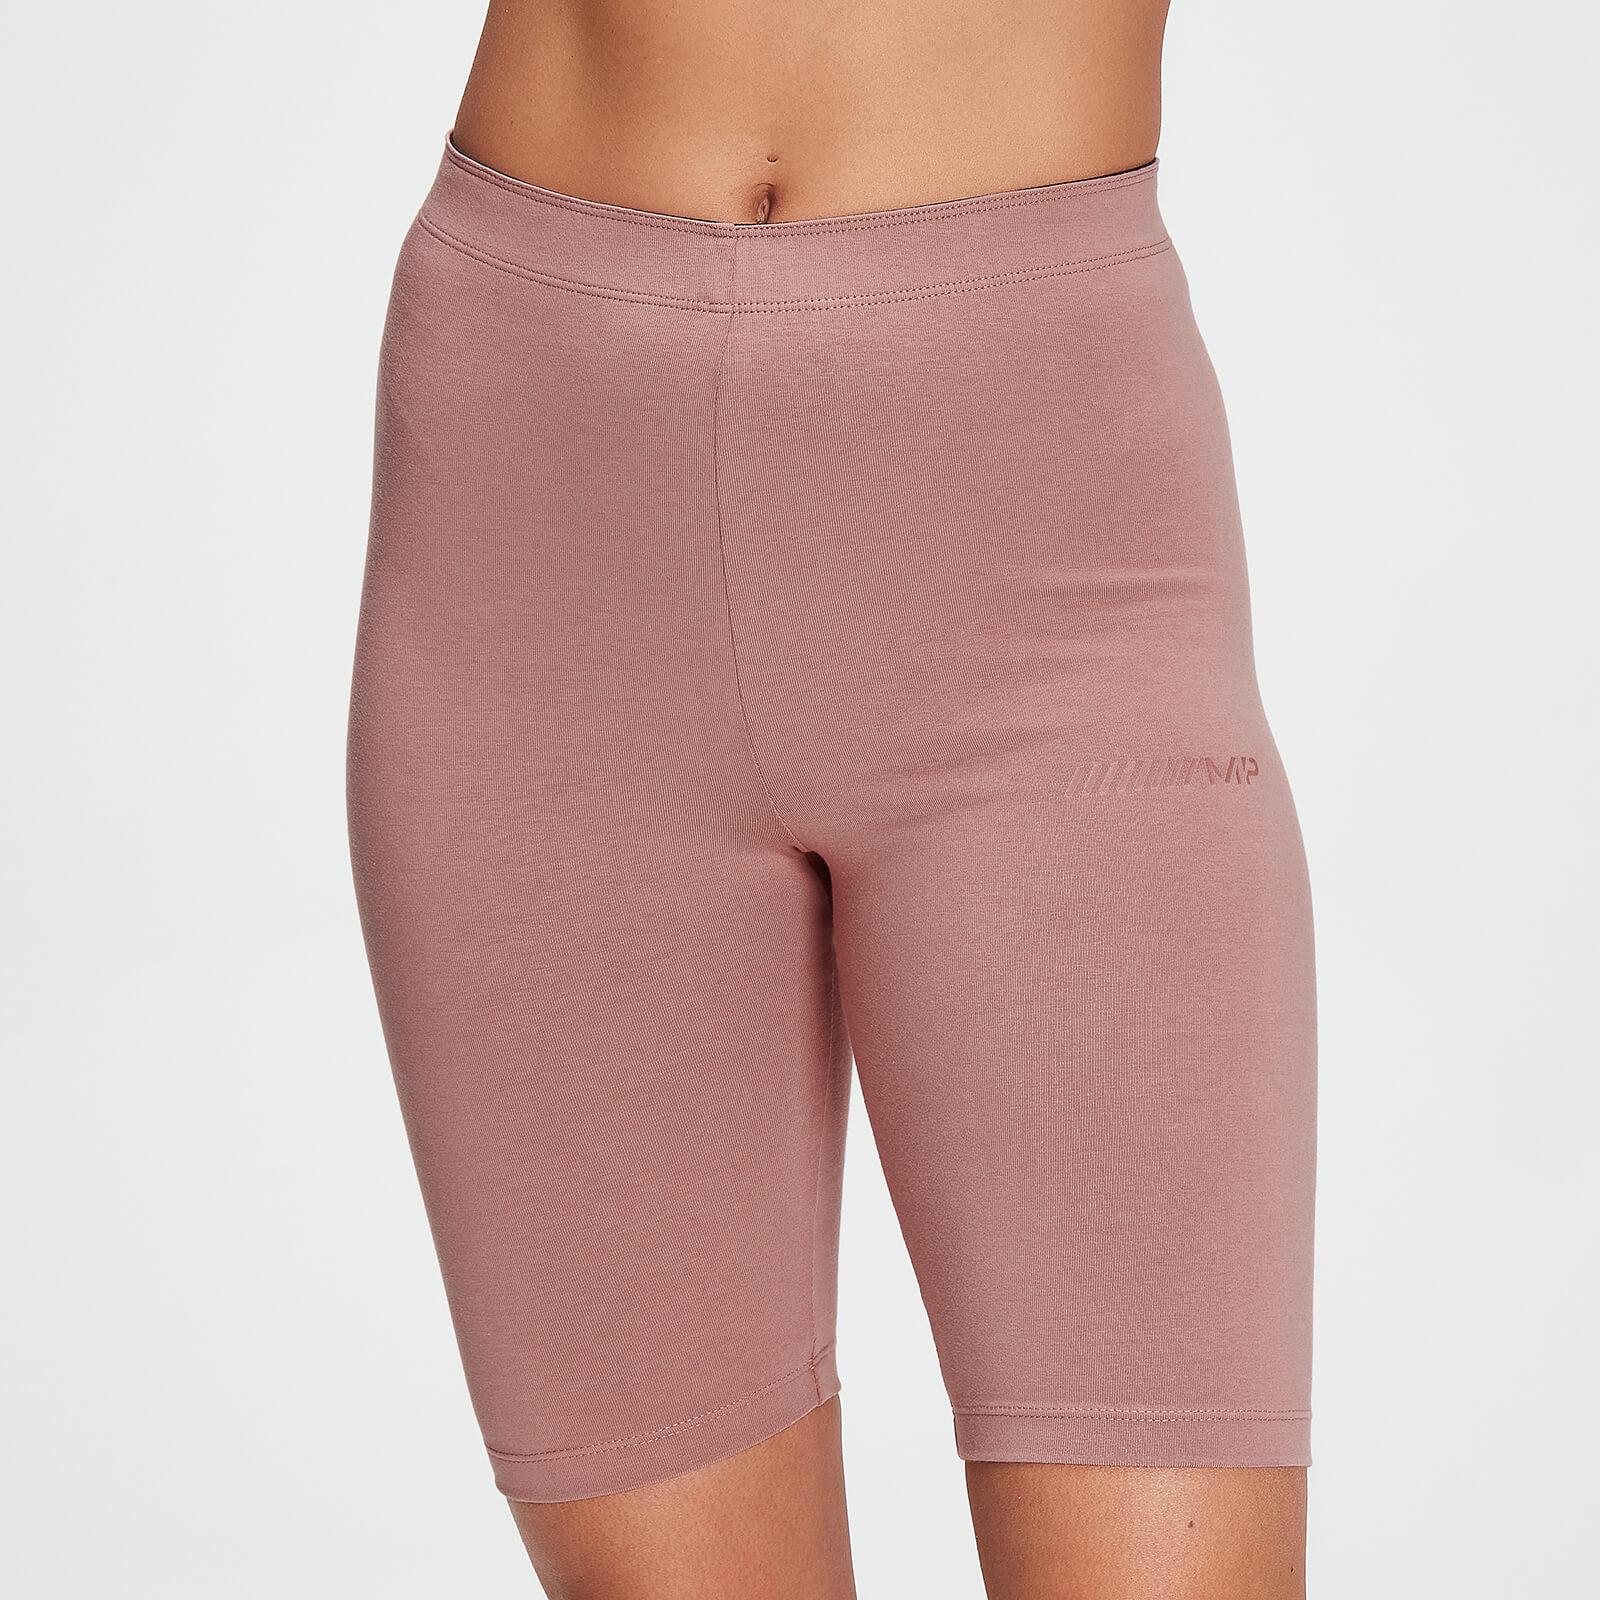 MP Damen Tonal Graphic Radlerhose – Washed Pink - XXS